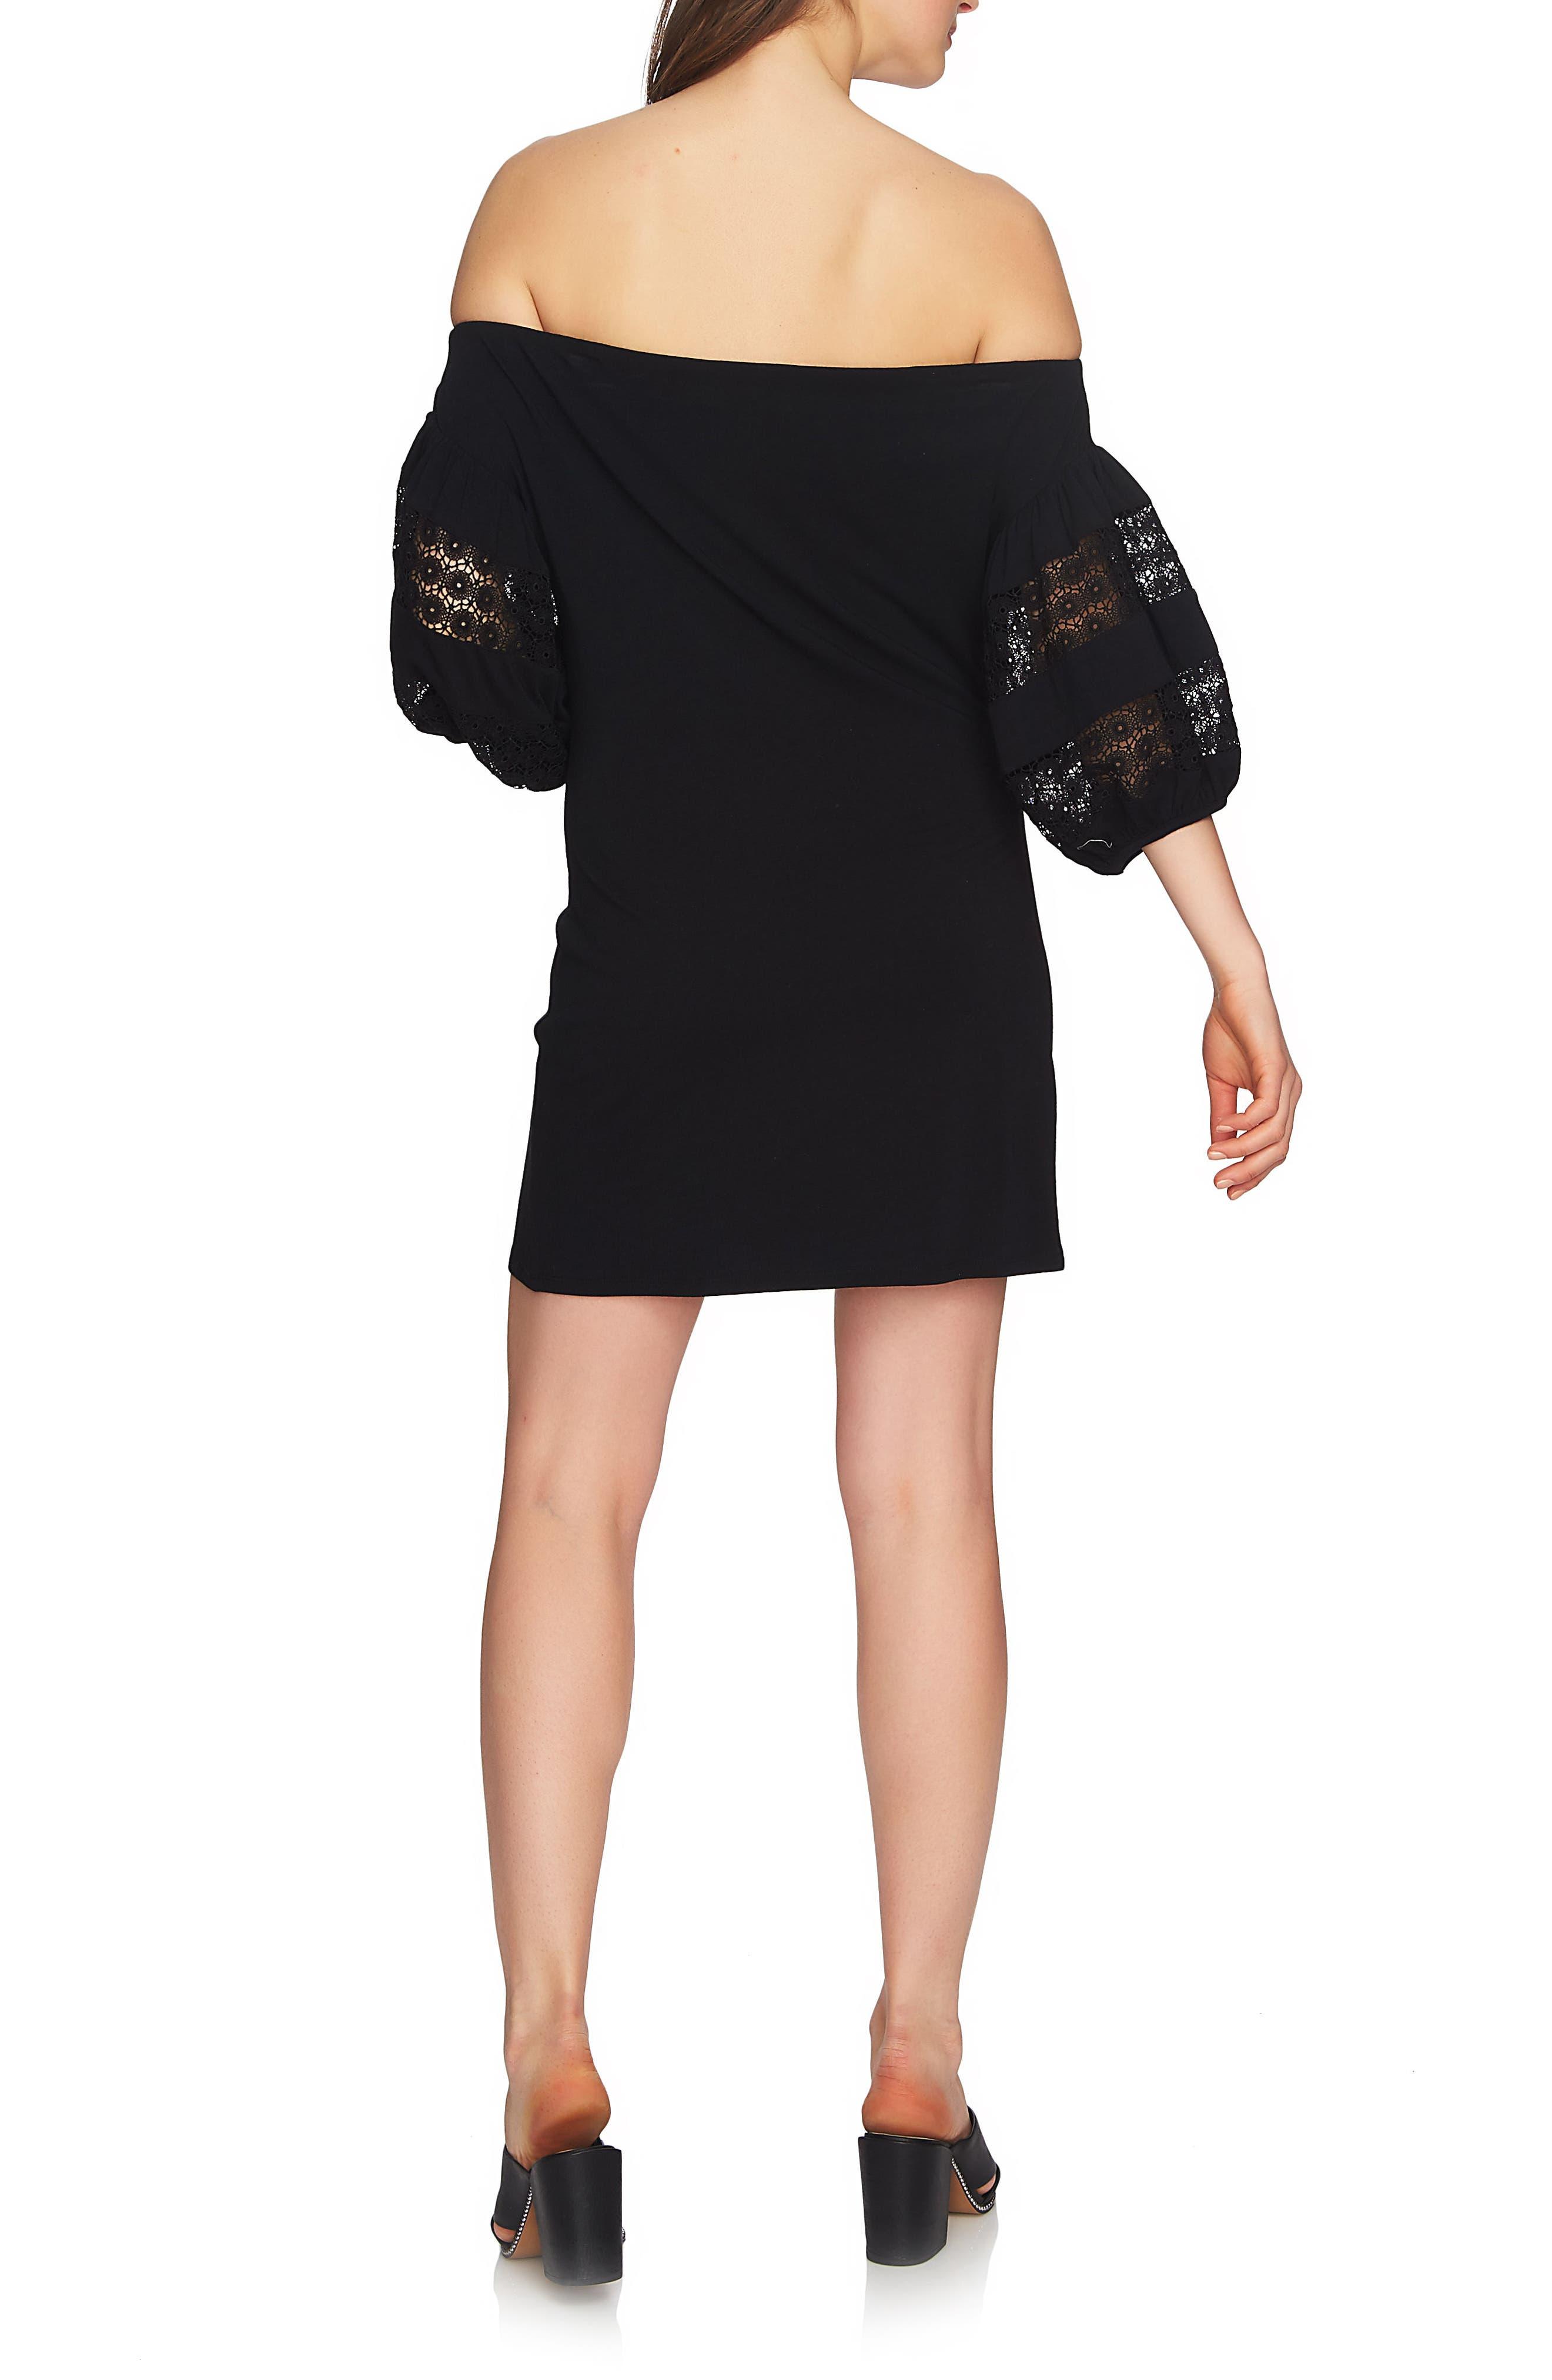 Off the Shoulder Knit Dress,                             Alternate thumbnail 2, color,                             Rich Black